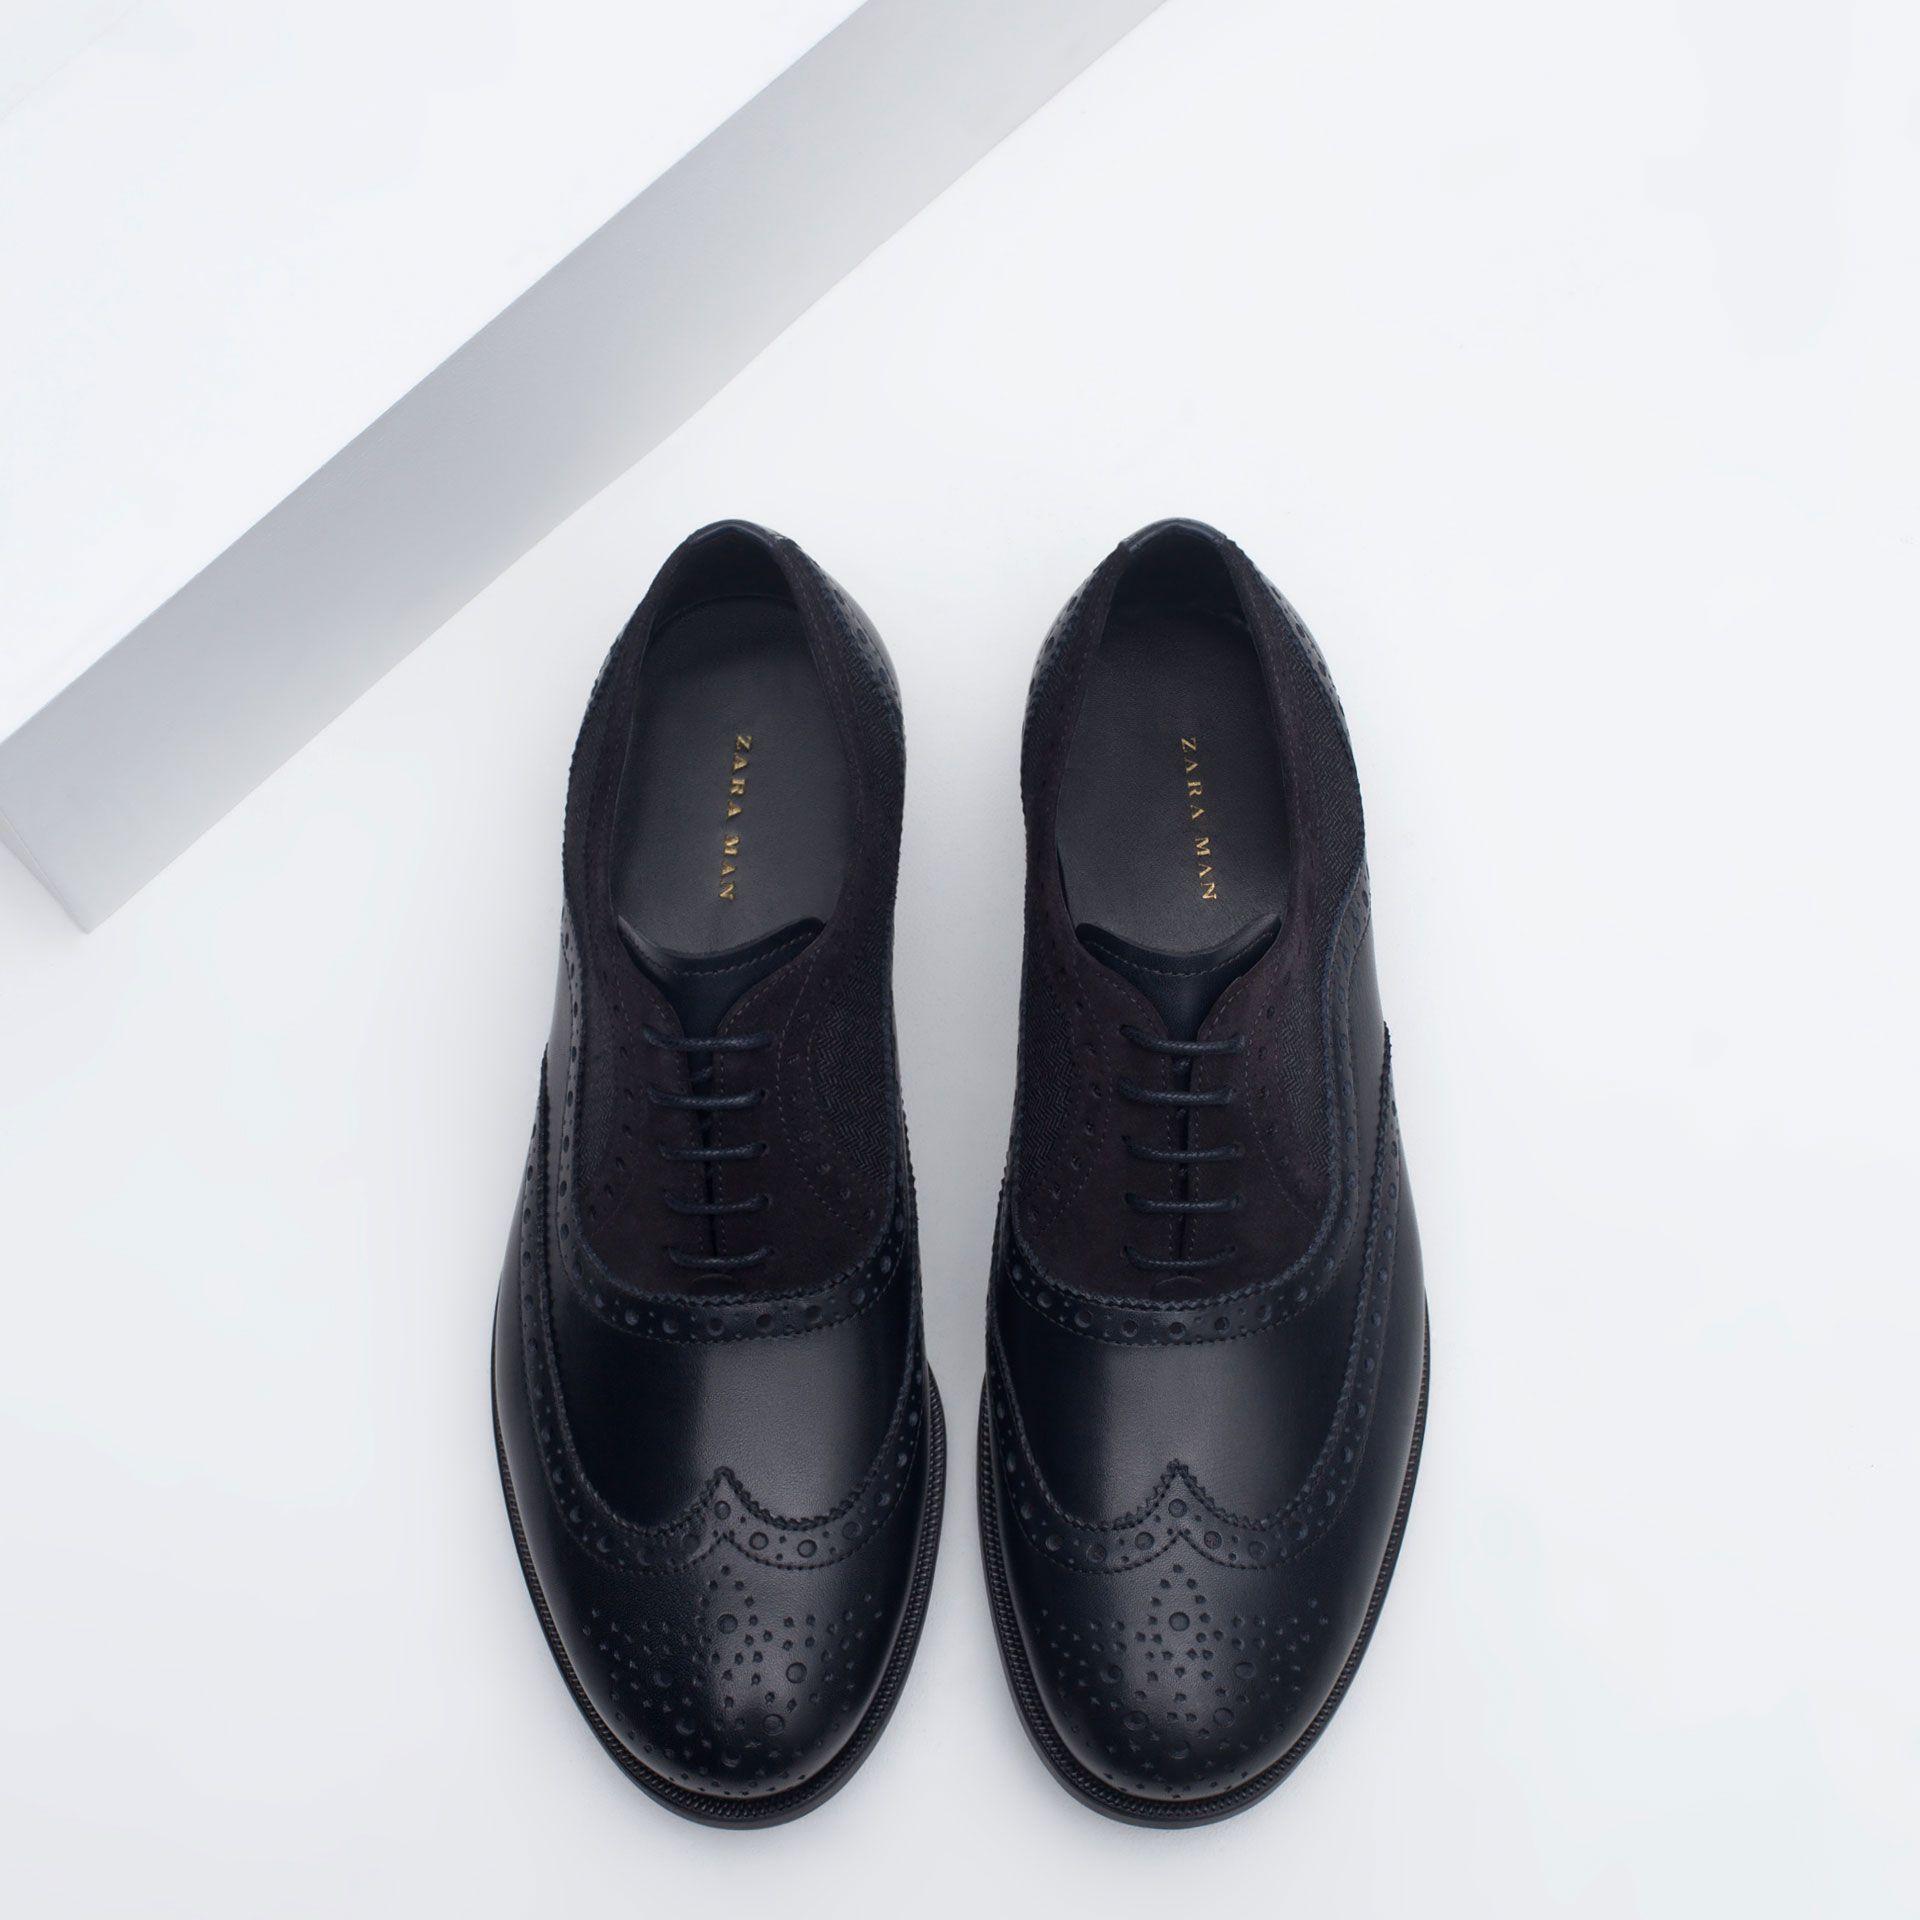 oxford shoes γυναικεια zara - Αναζήτηση Google